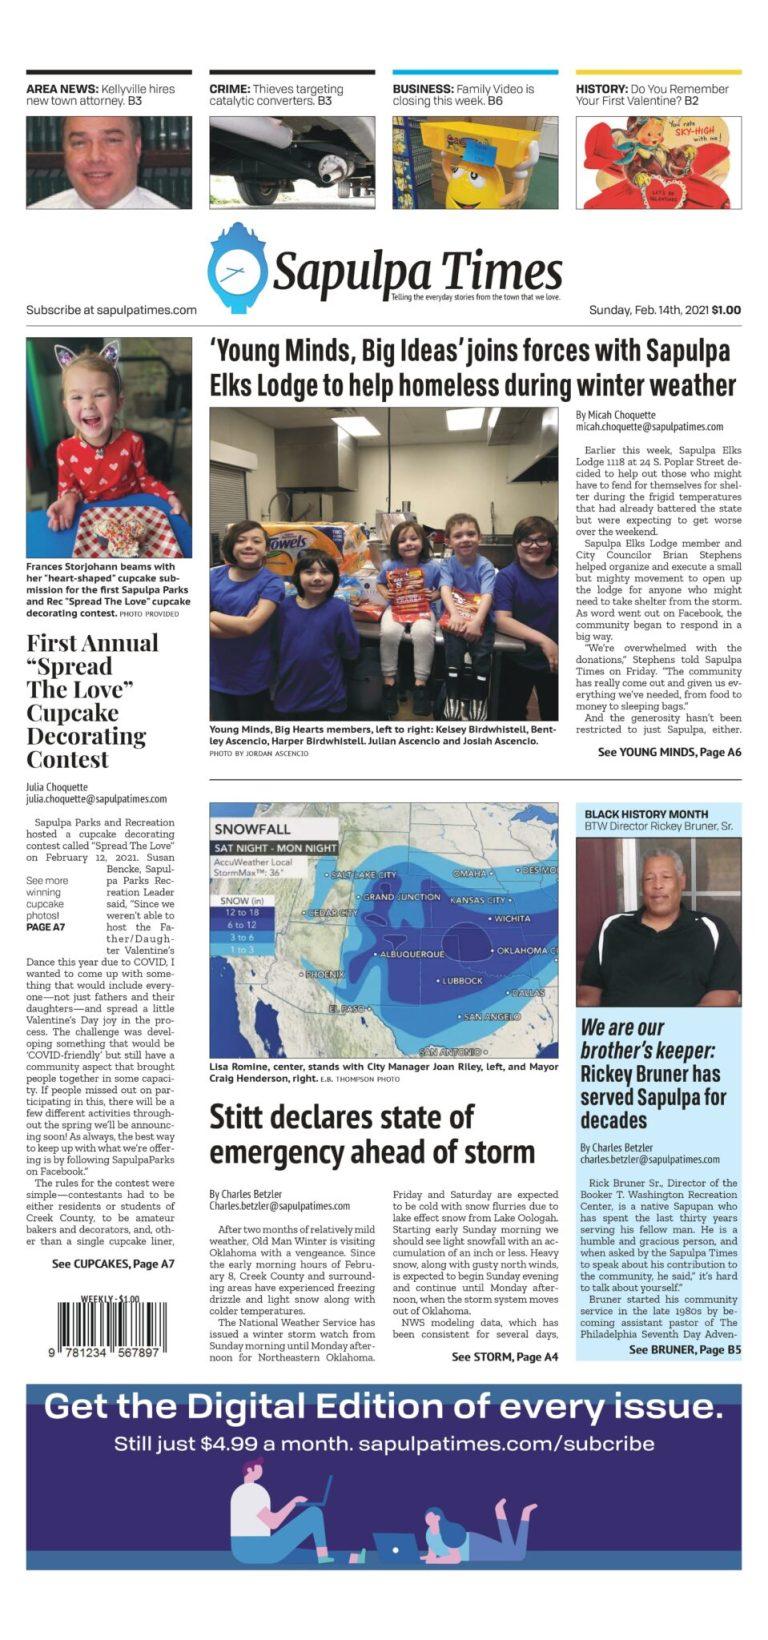 Sapulpa Times Digital Edition 02/14/2021